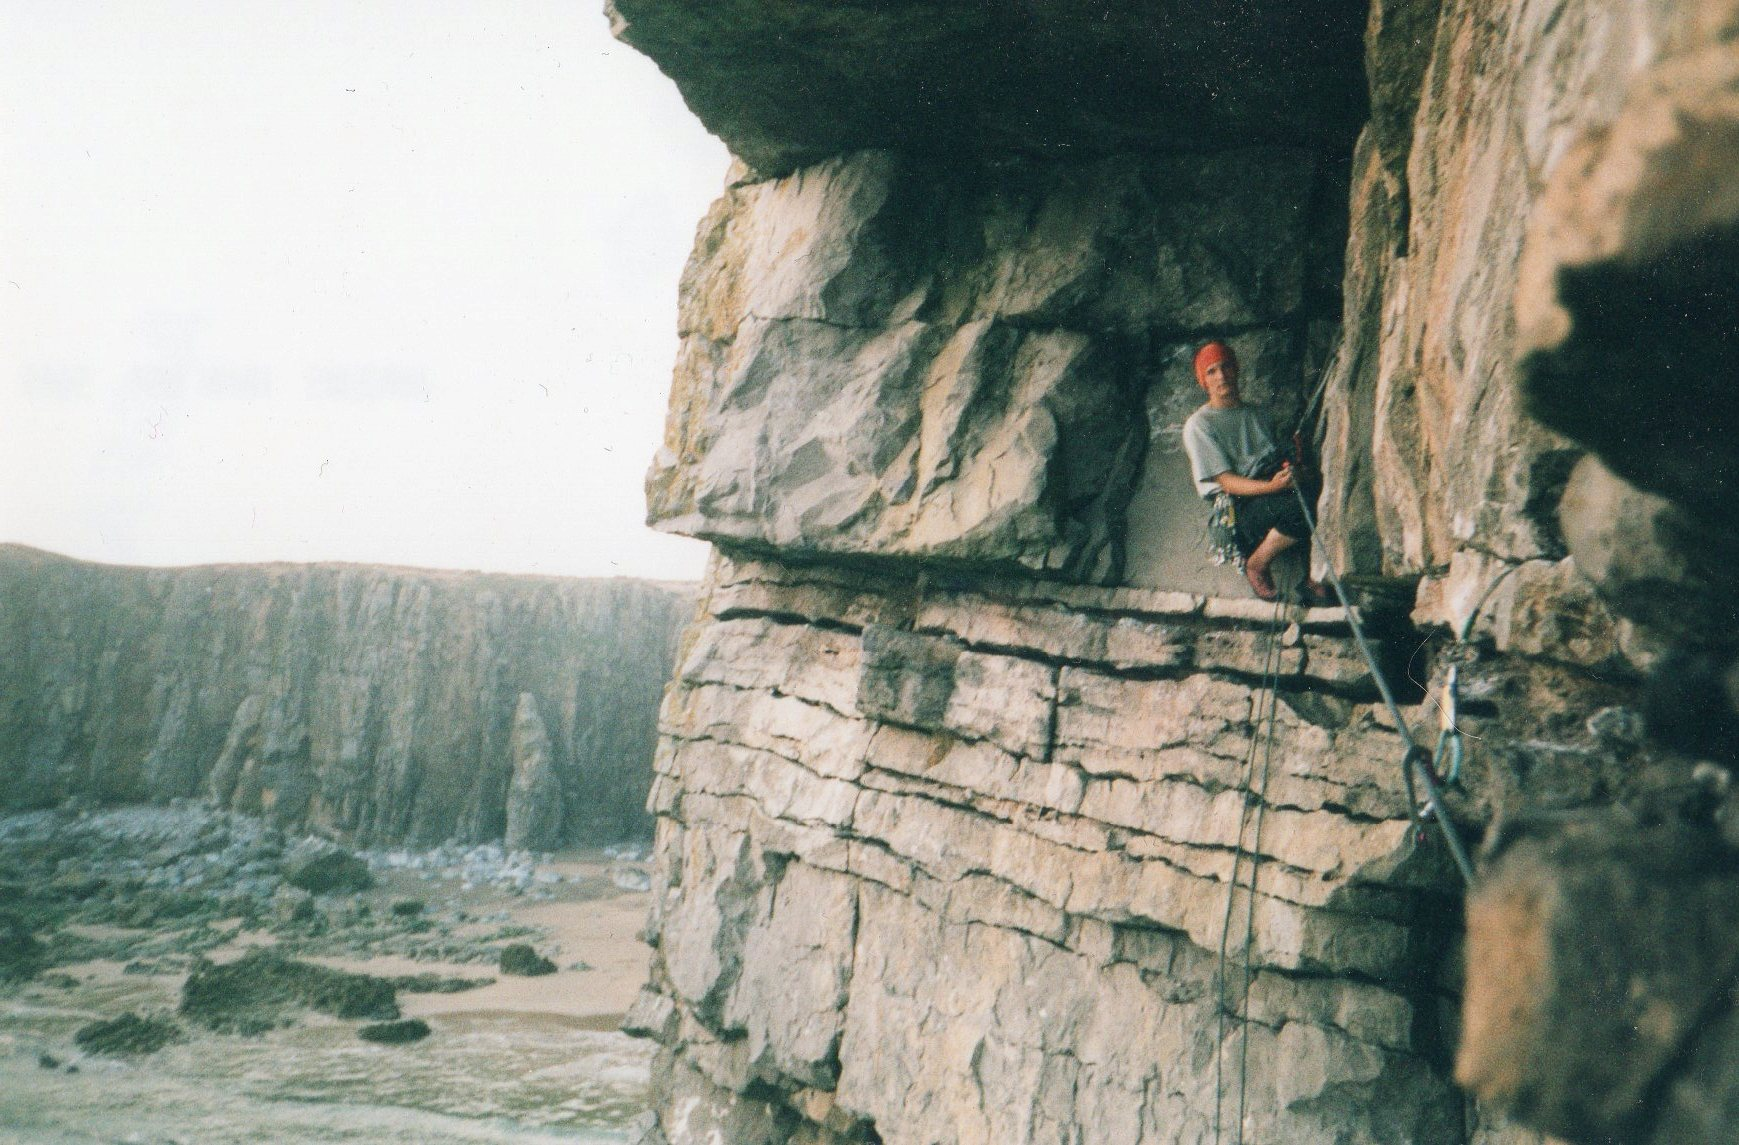 Climbing in my teens.